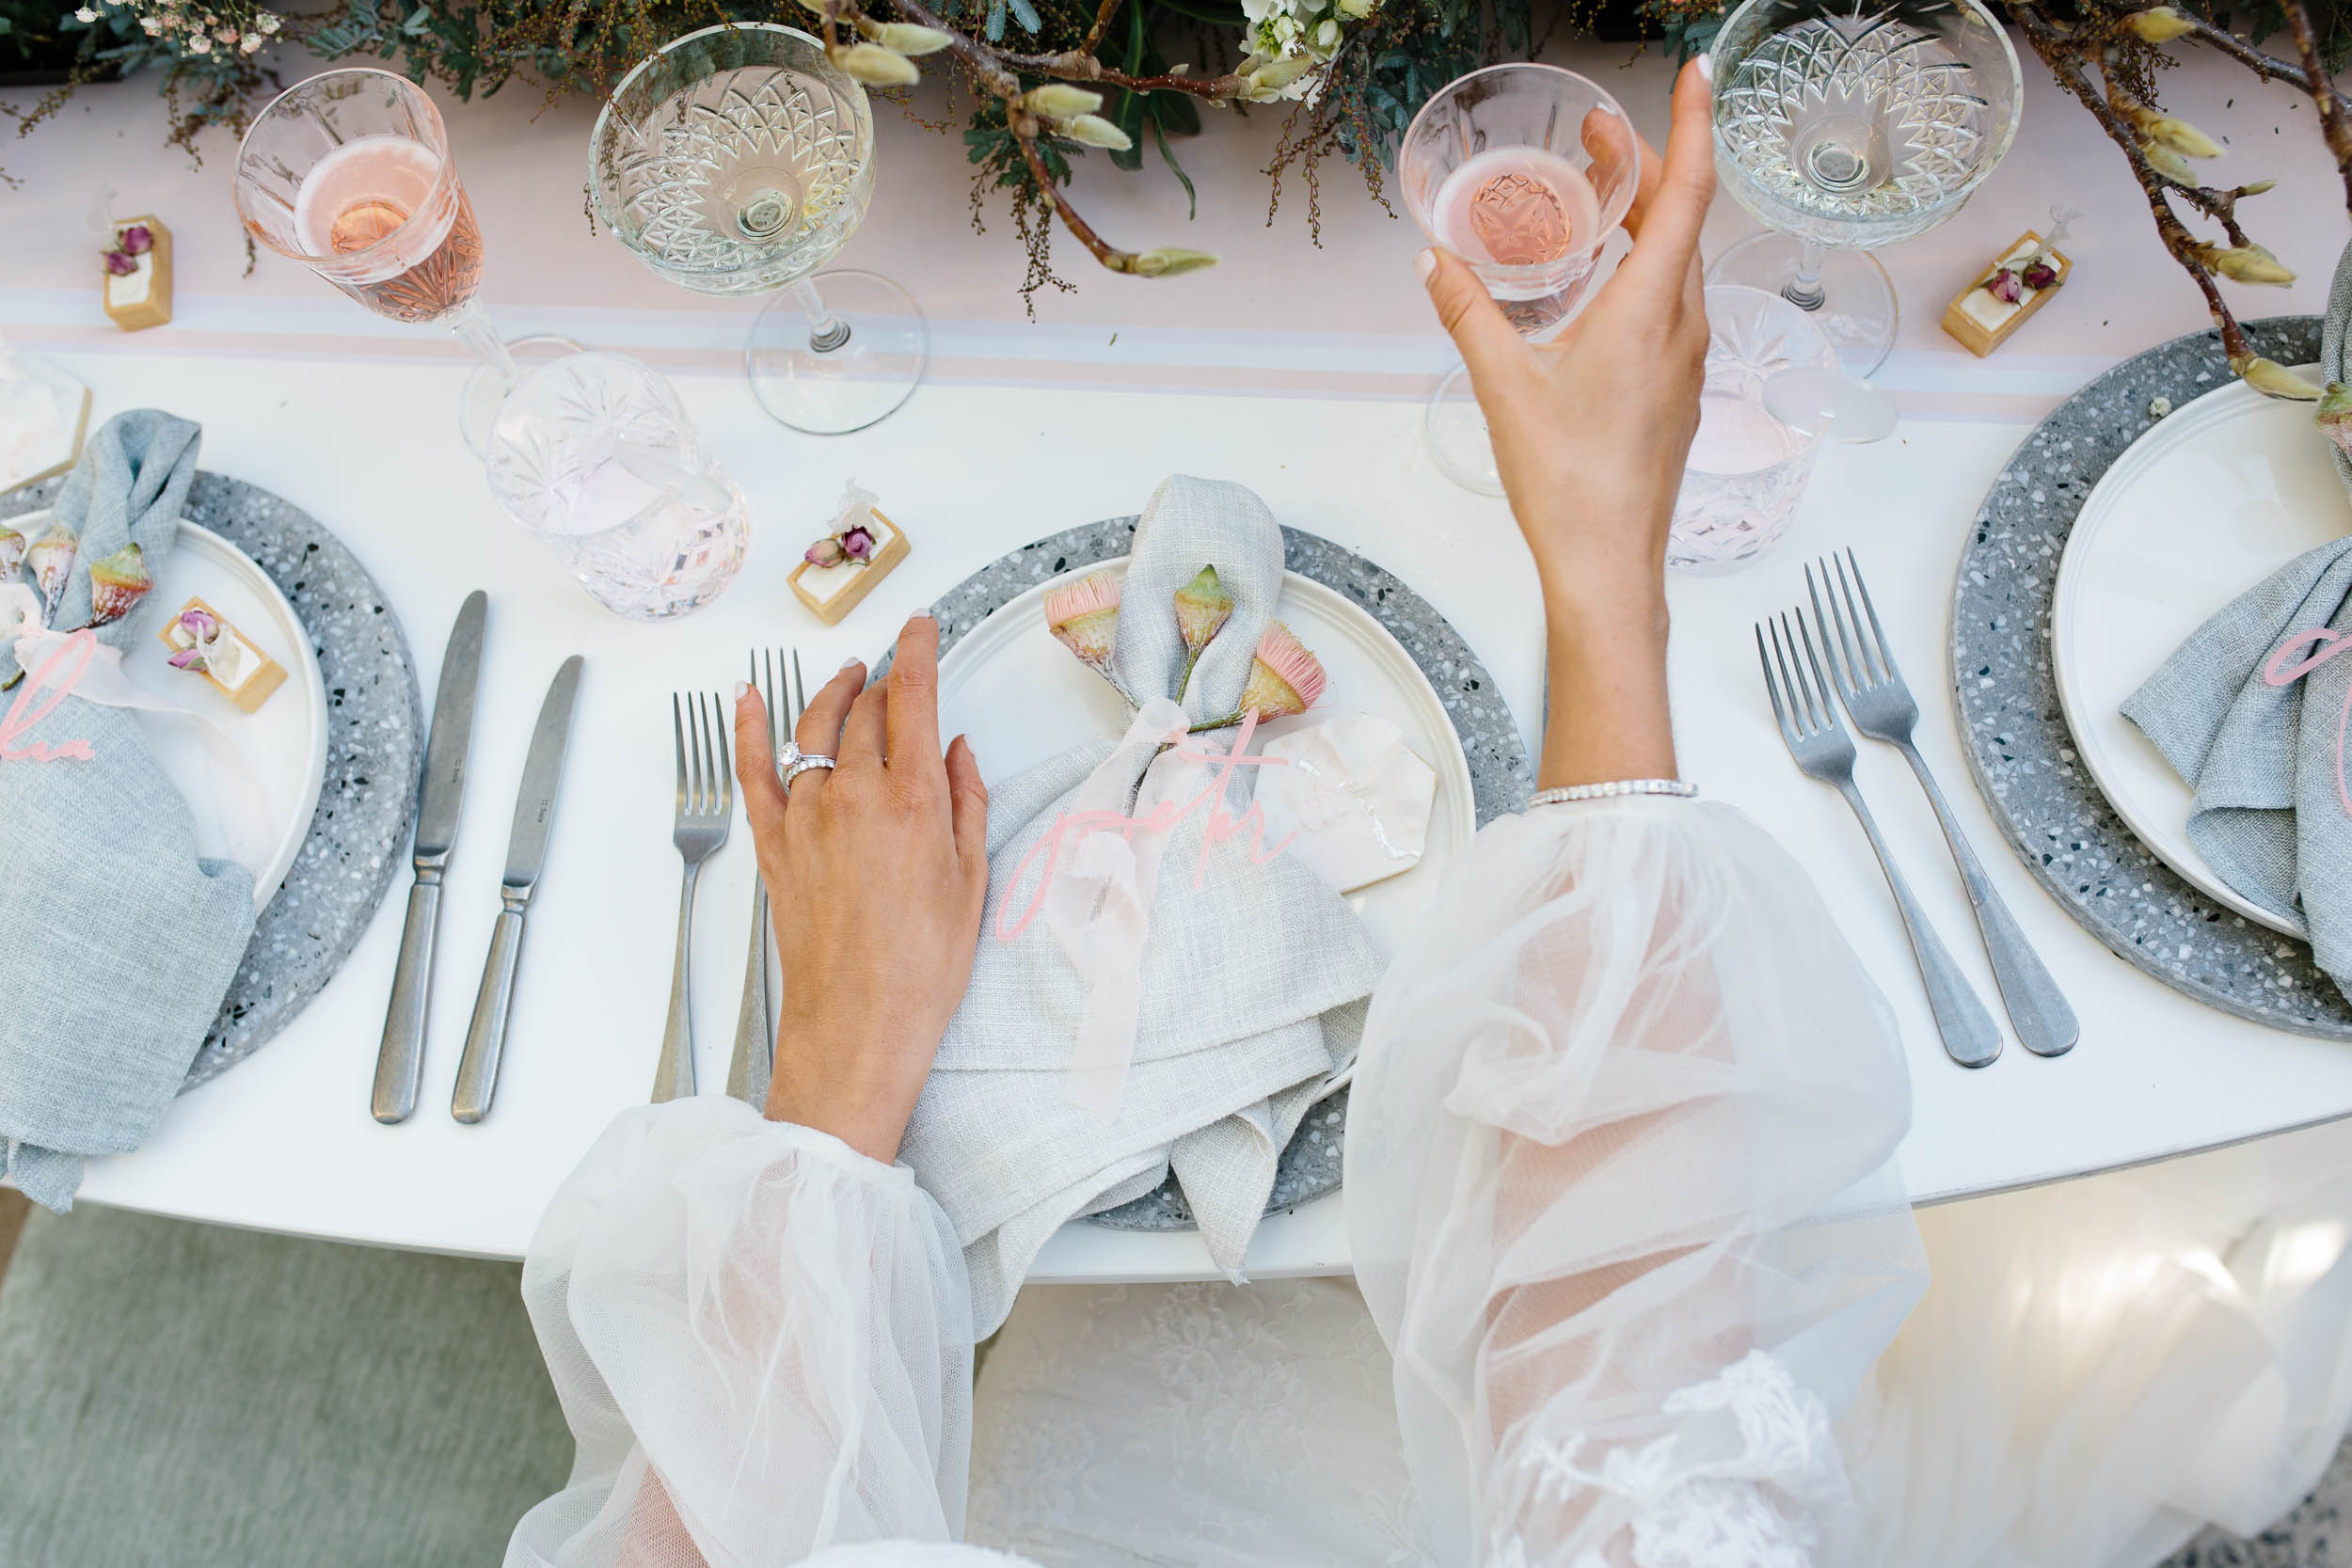 Kas-Richards-LENZO-Yarra-Valley-Wedding-One-Day-Bridal-278.jpg